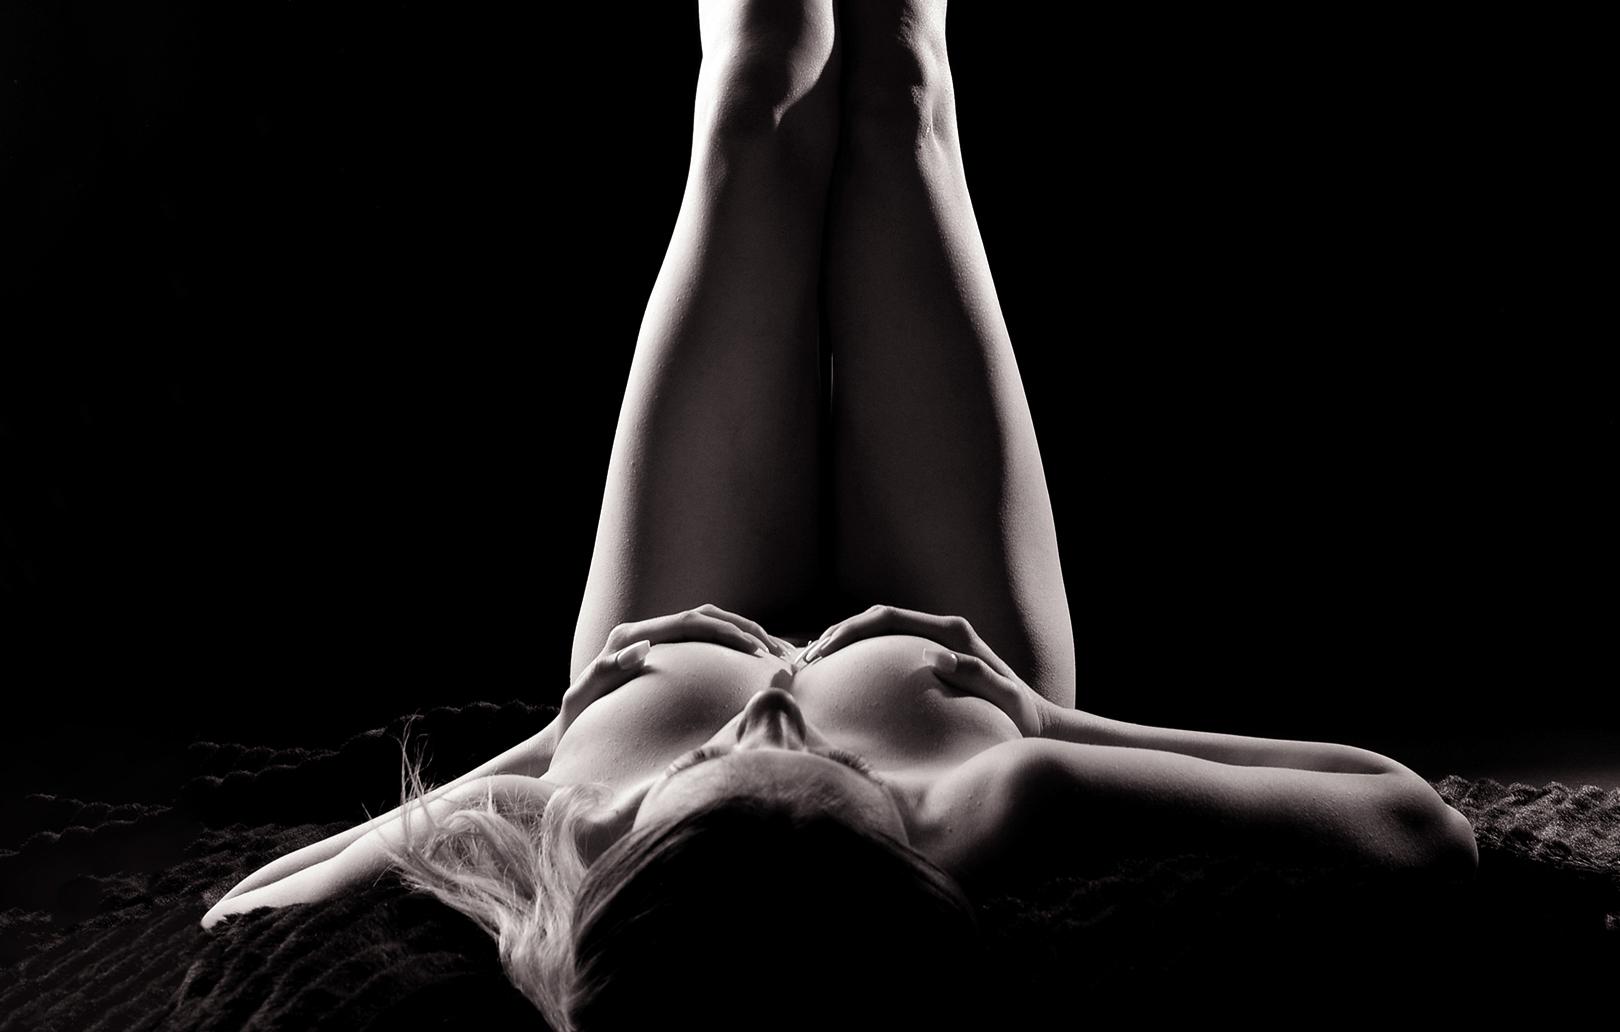 erotisches-fotoshooting-chemnitz-bg11610453266